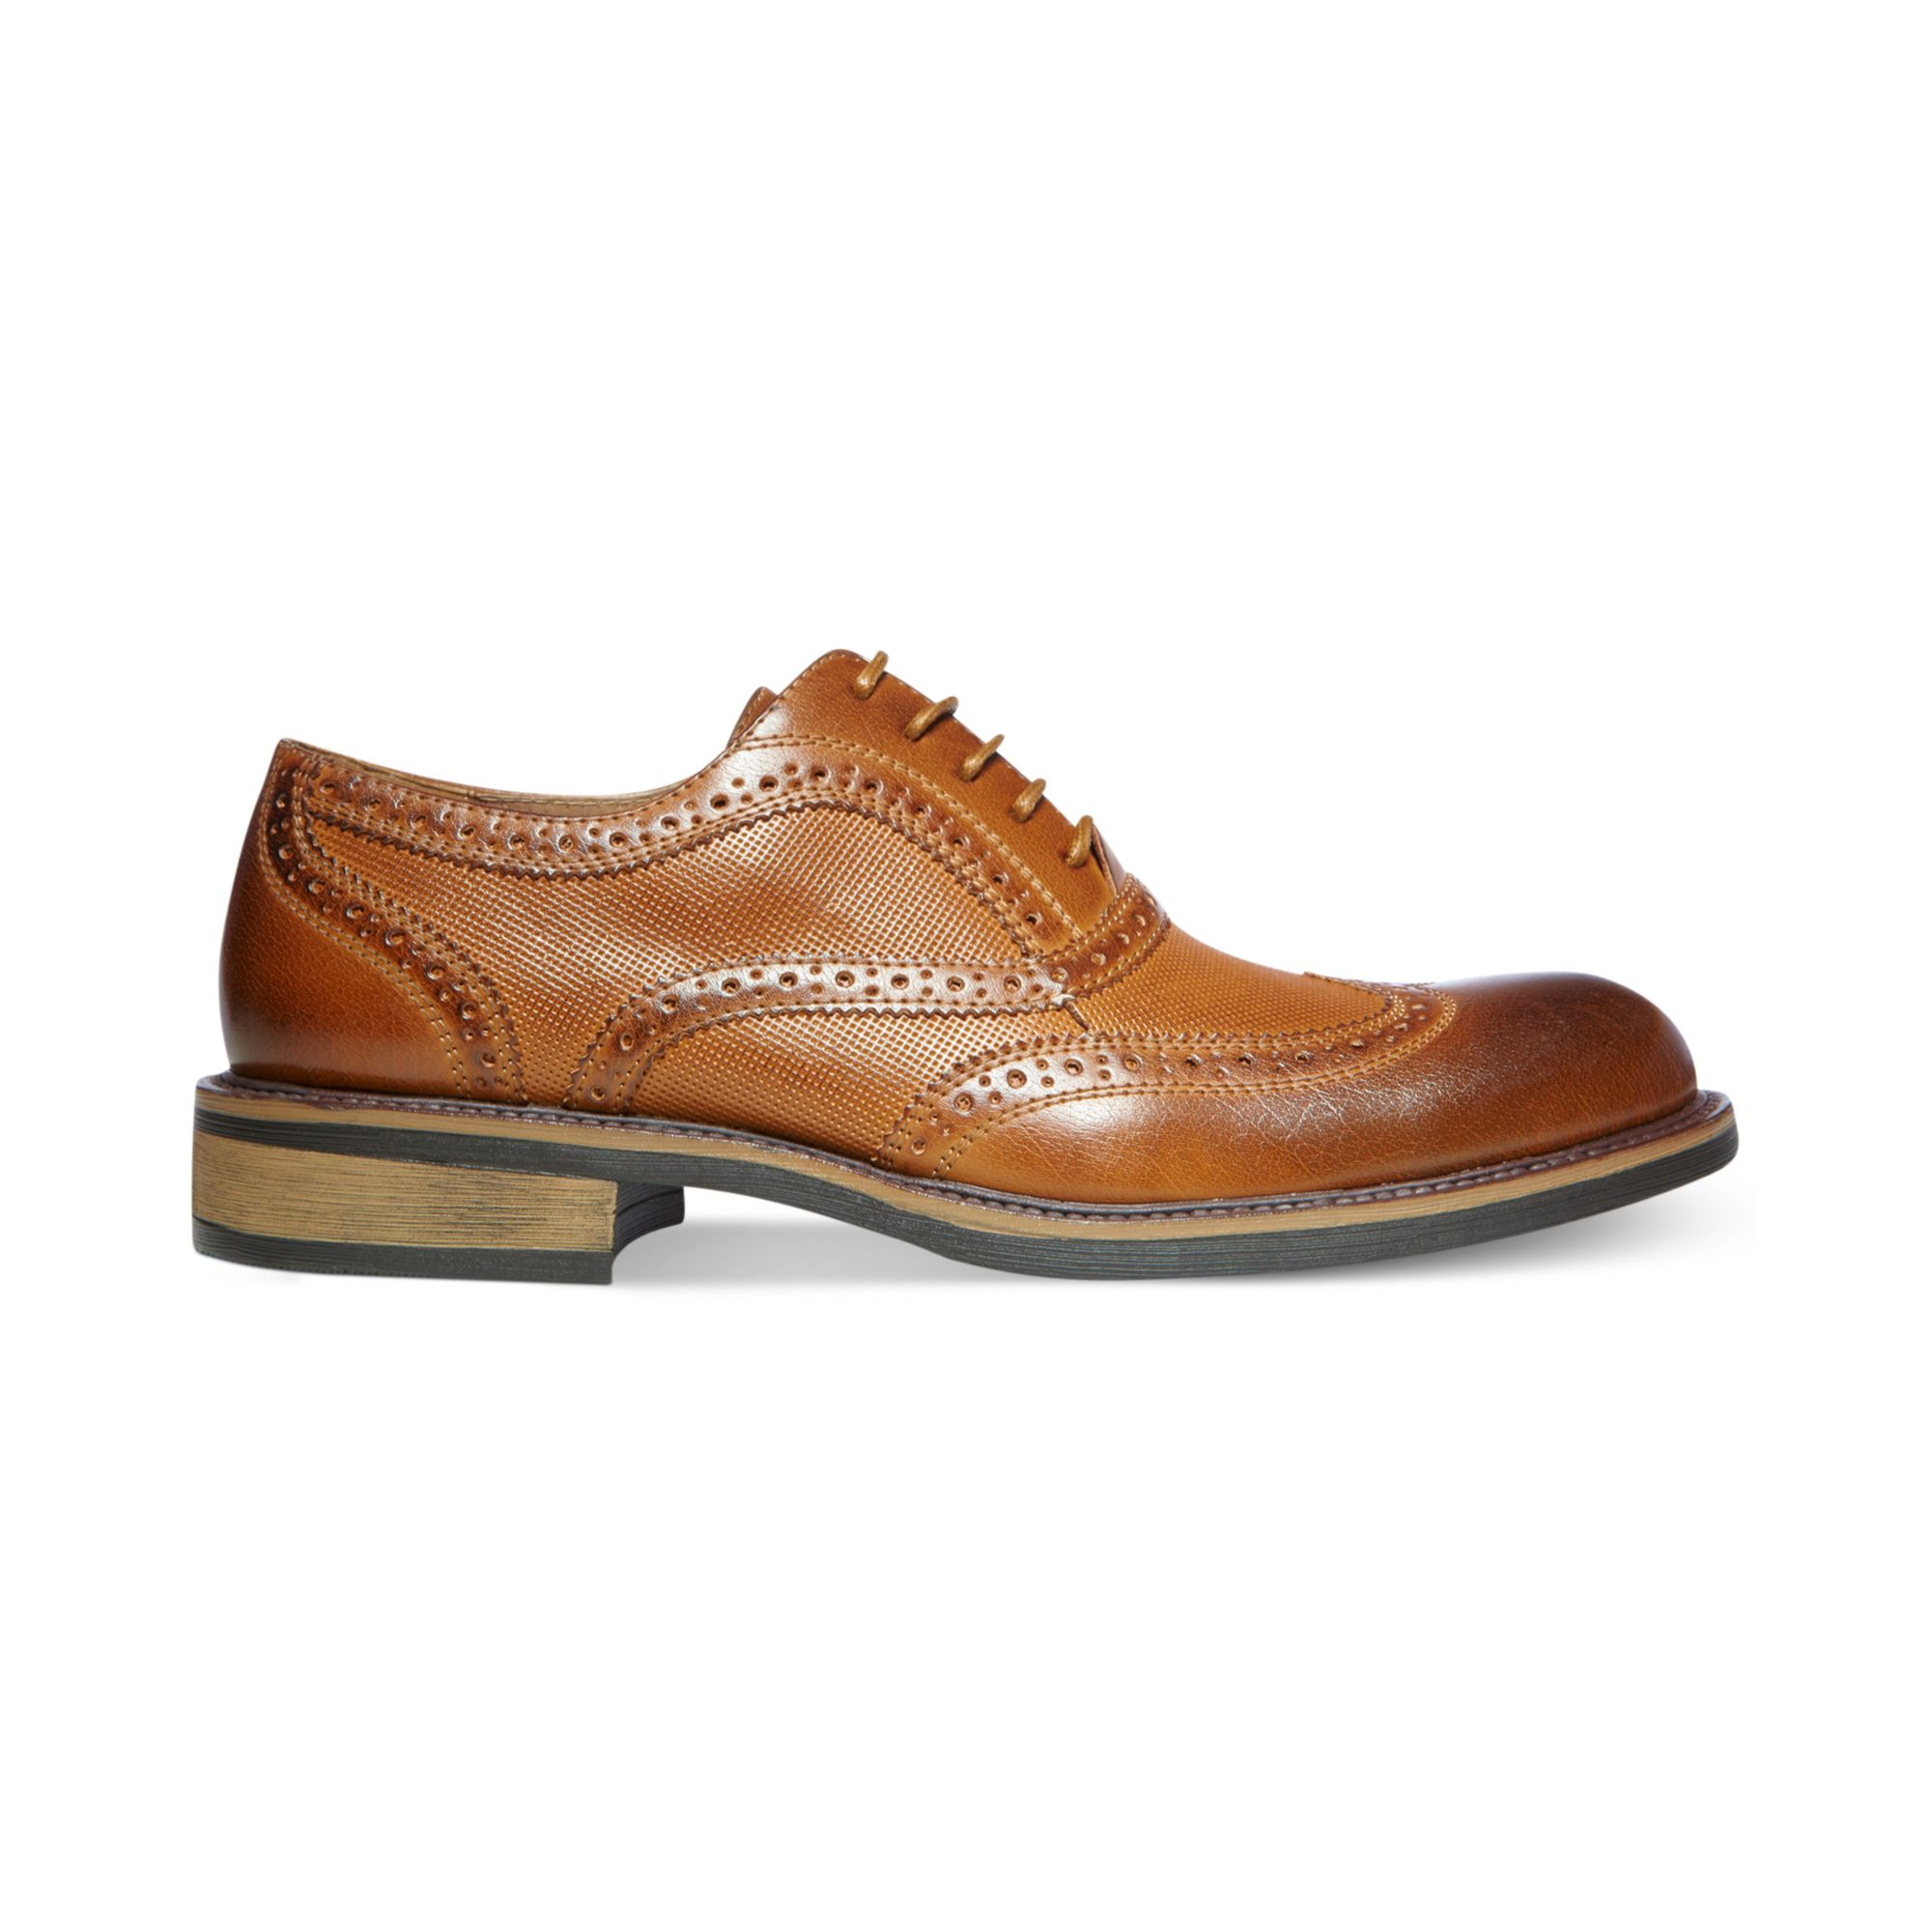 steve madden madden zane wingtip dress shoes in brown for